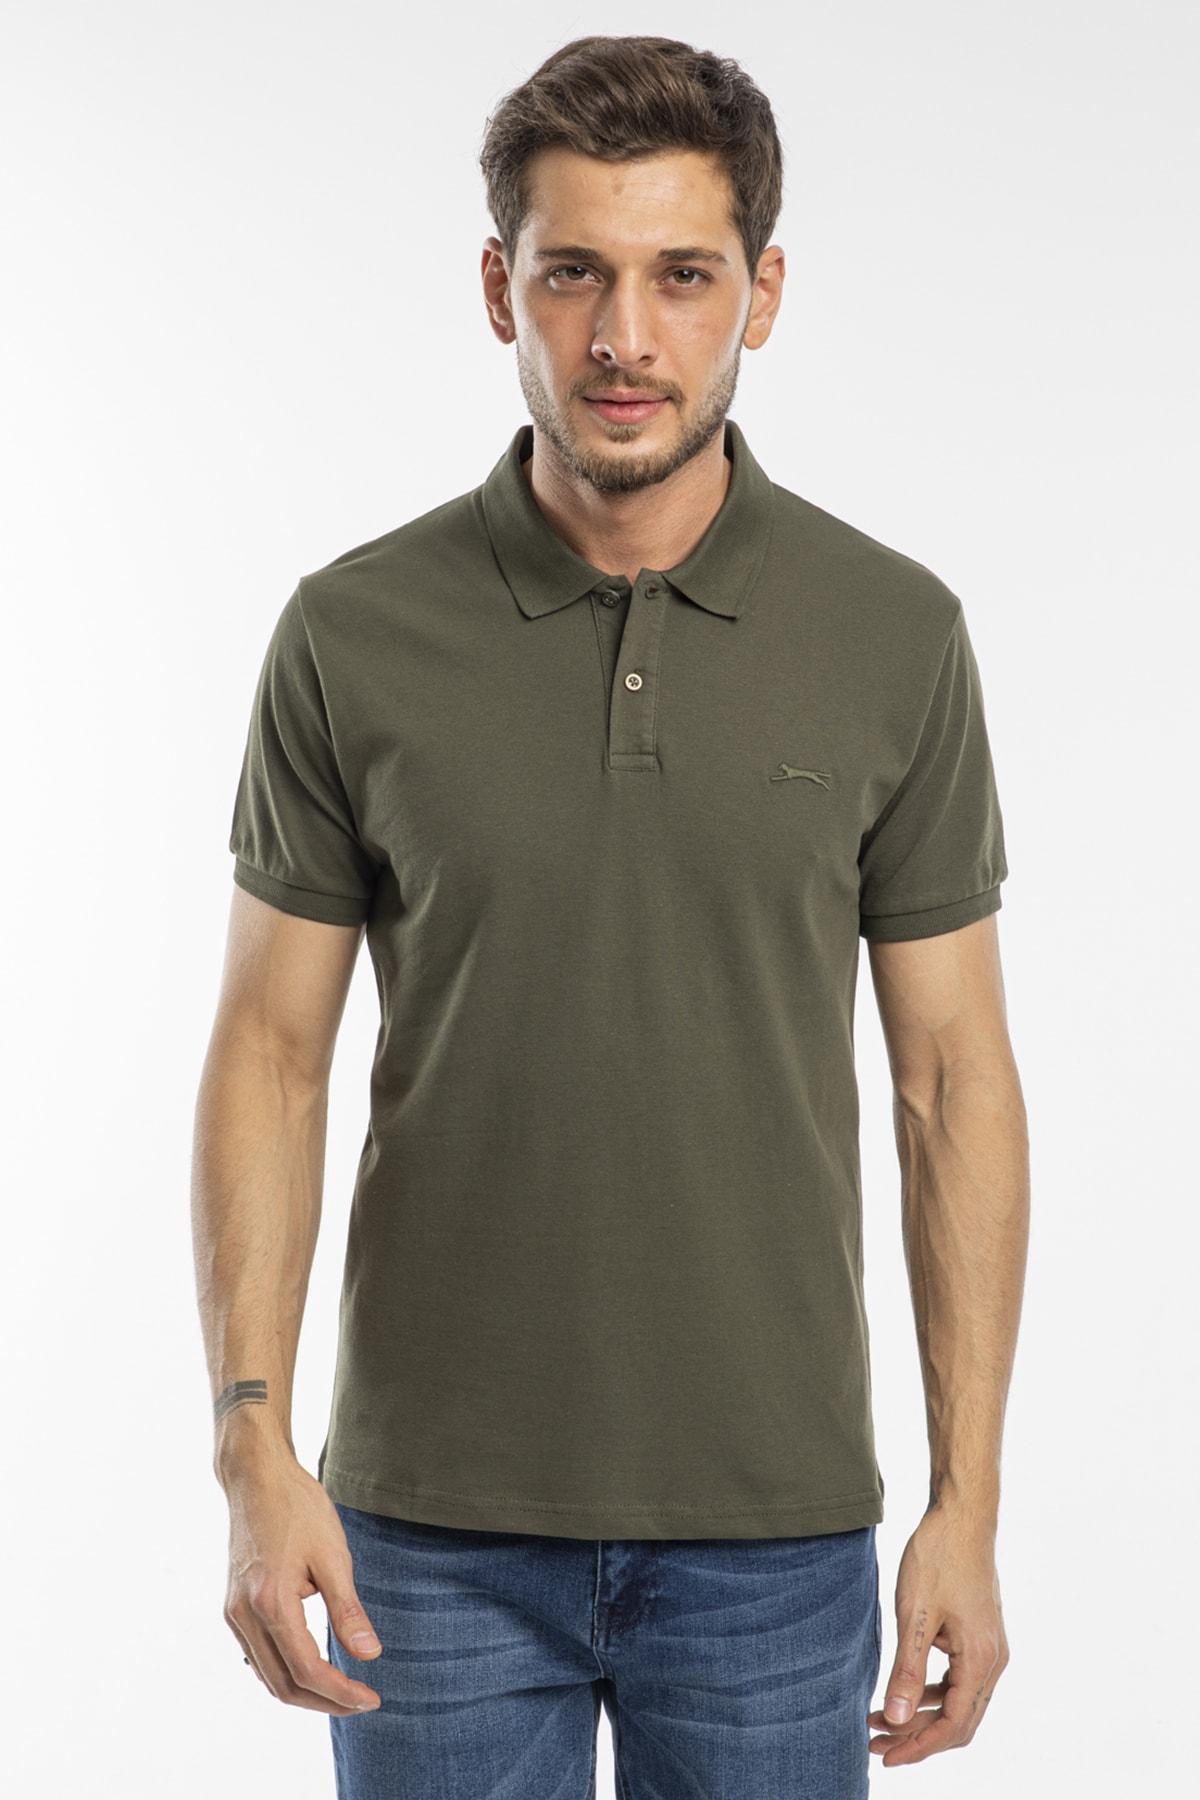 Salvator Erkek T-shirt Haki St11te081